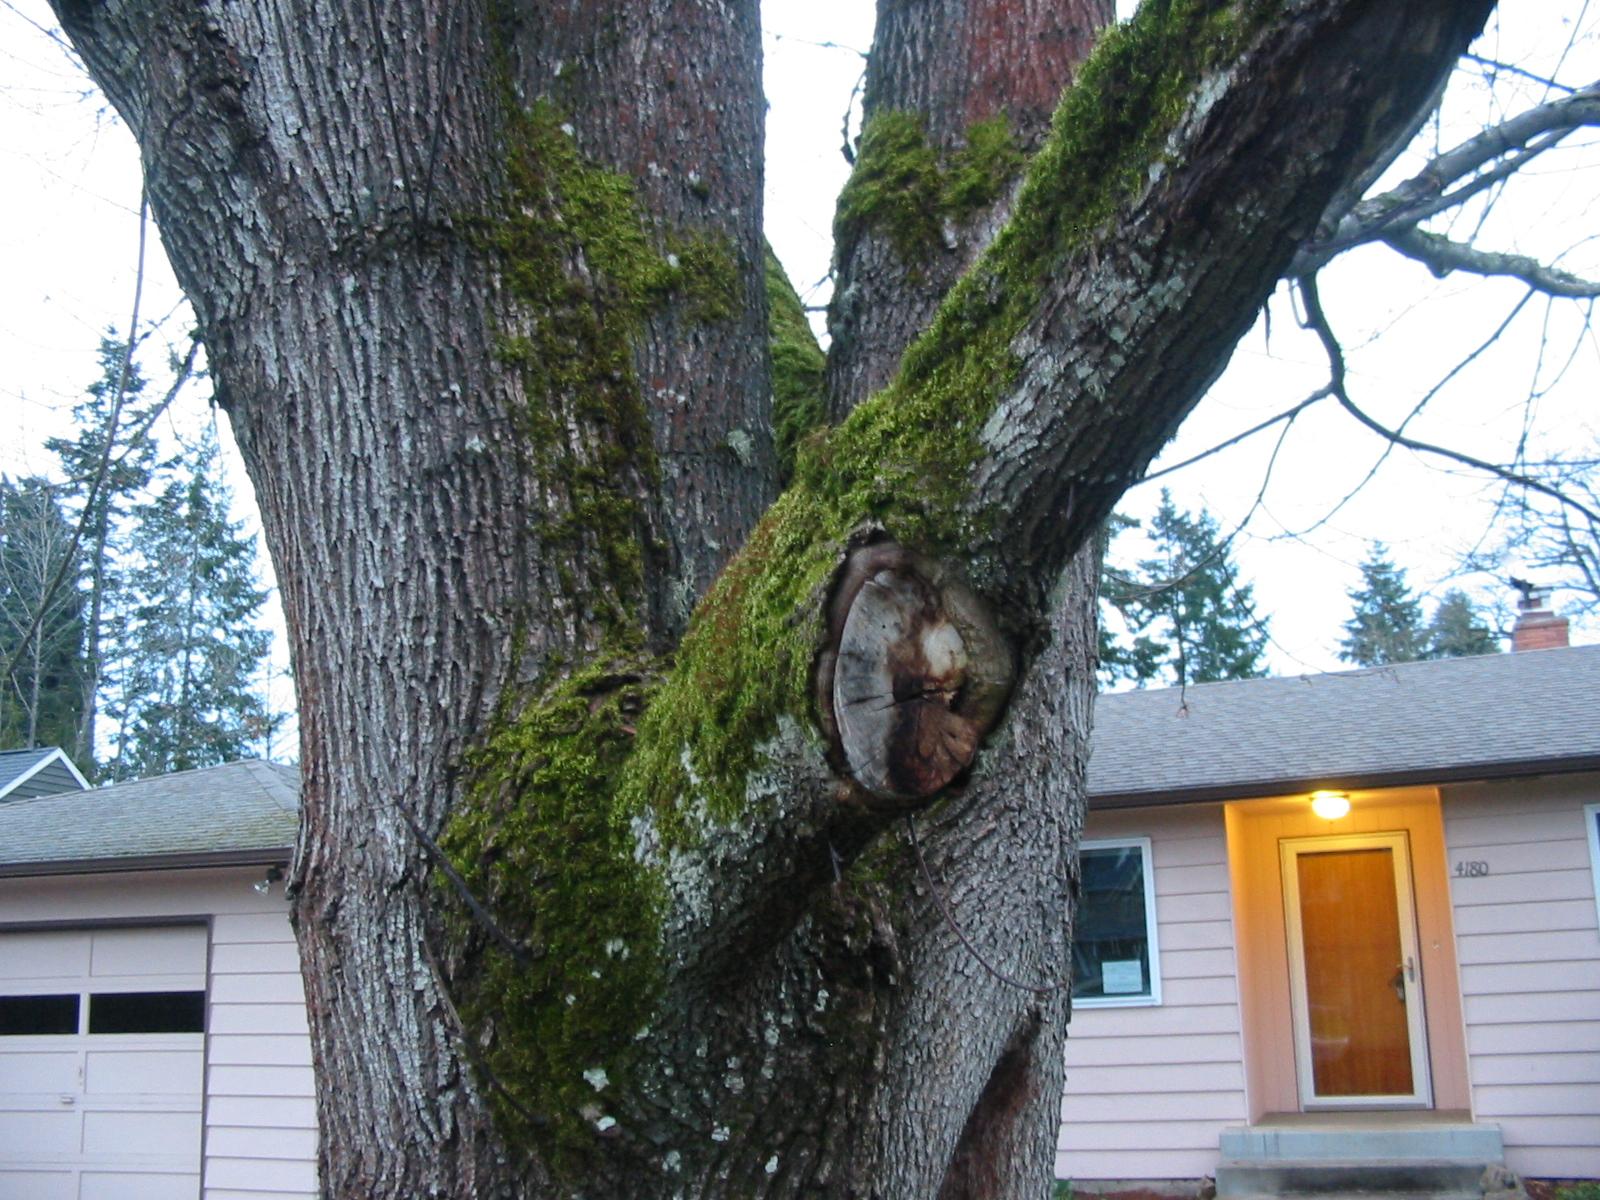 http://www.keithl.com/tree2.jpg